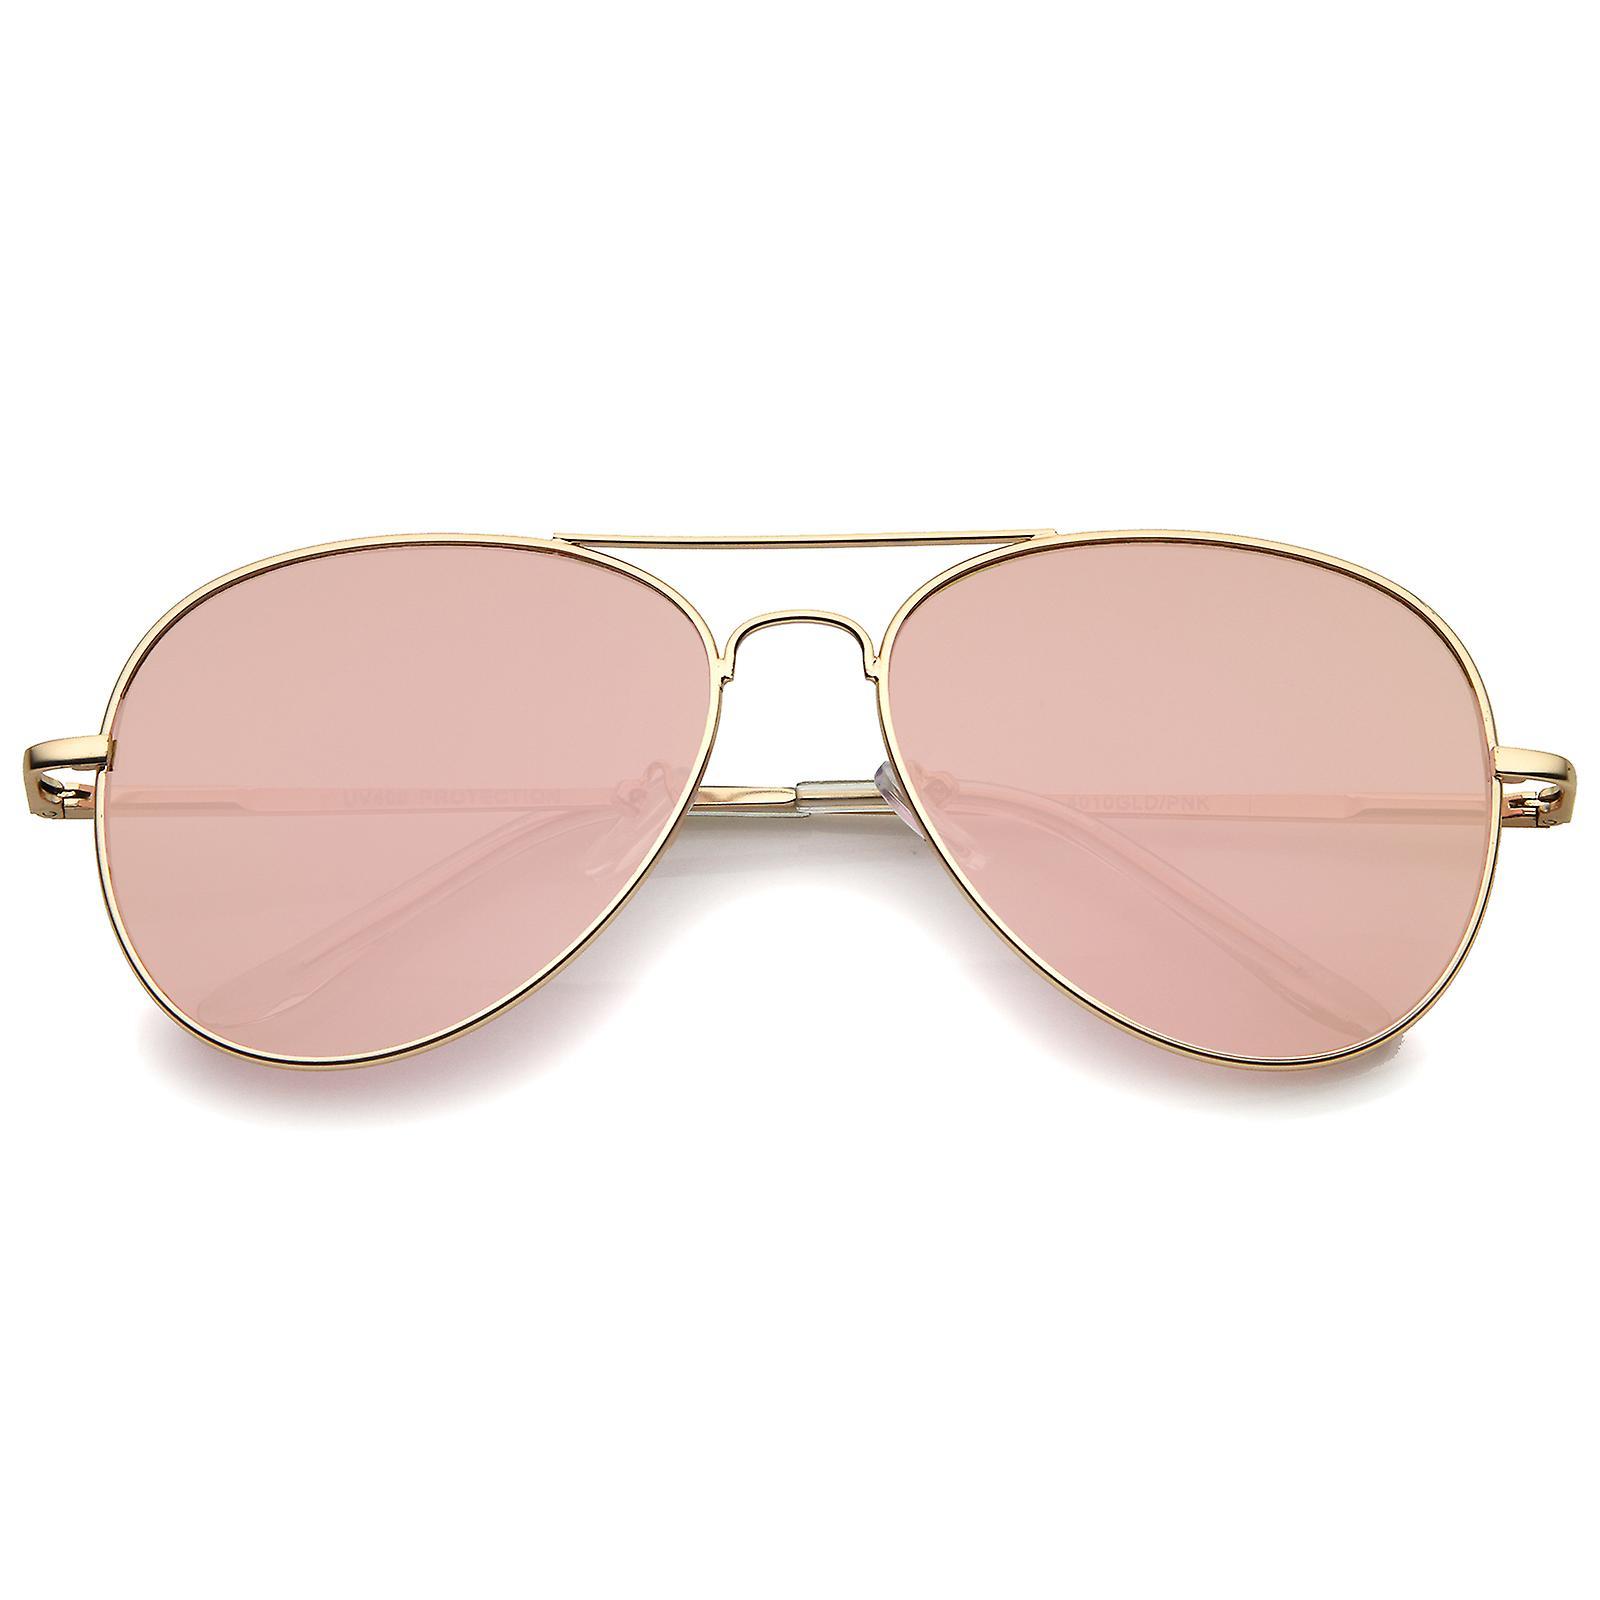 d7ce677979c6 Pequeño mate Metal oro rosa espejo plano lente aviador gafas de sol 56mm